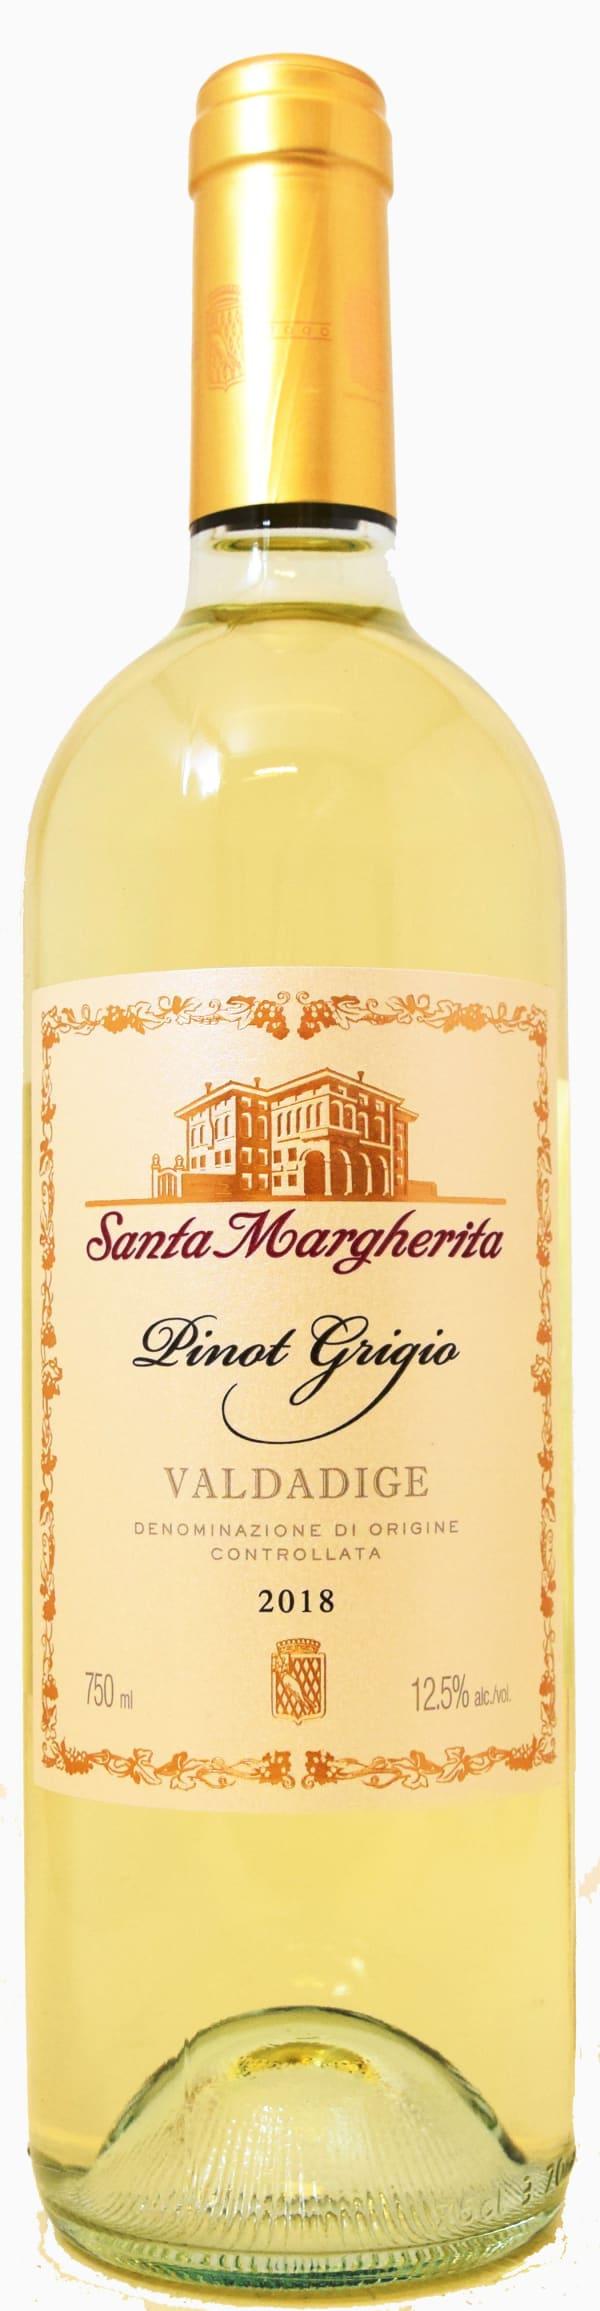 Santa Margherita Pinot Grigio 2020